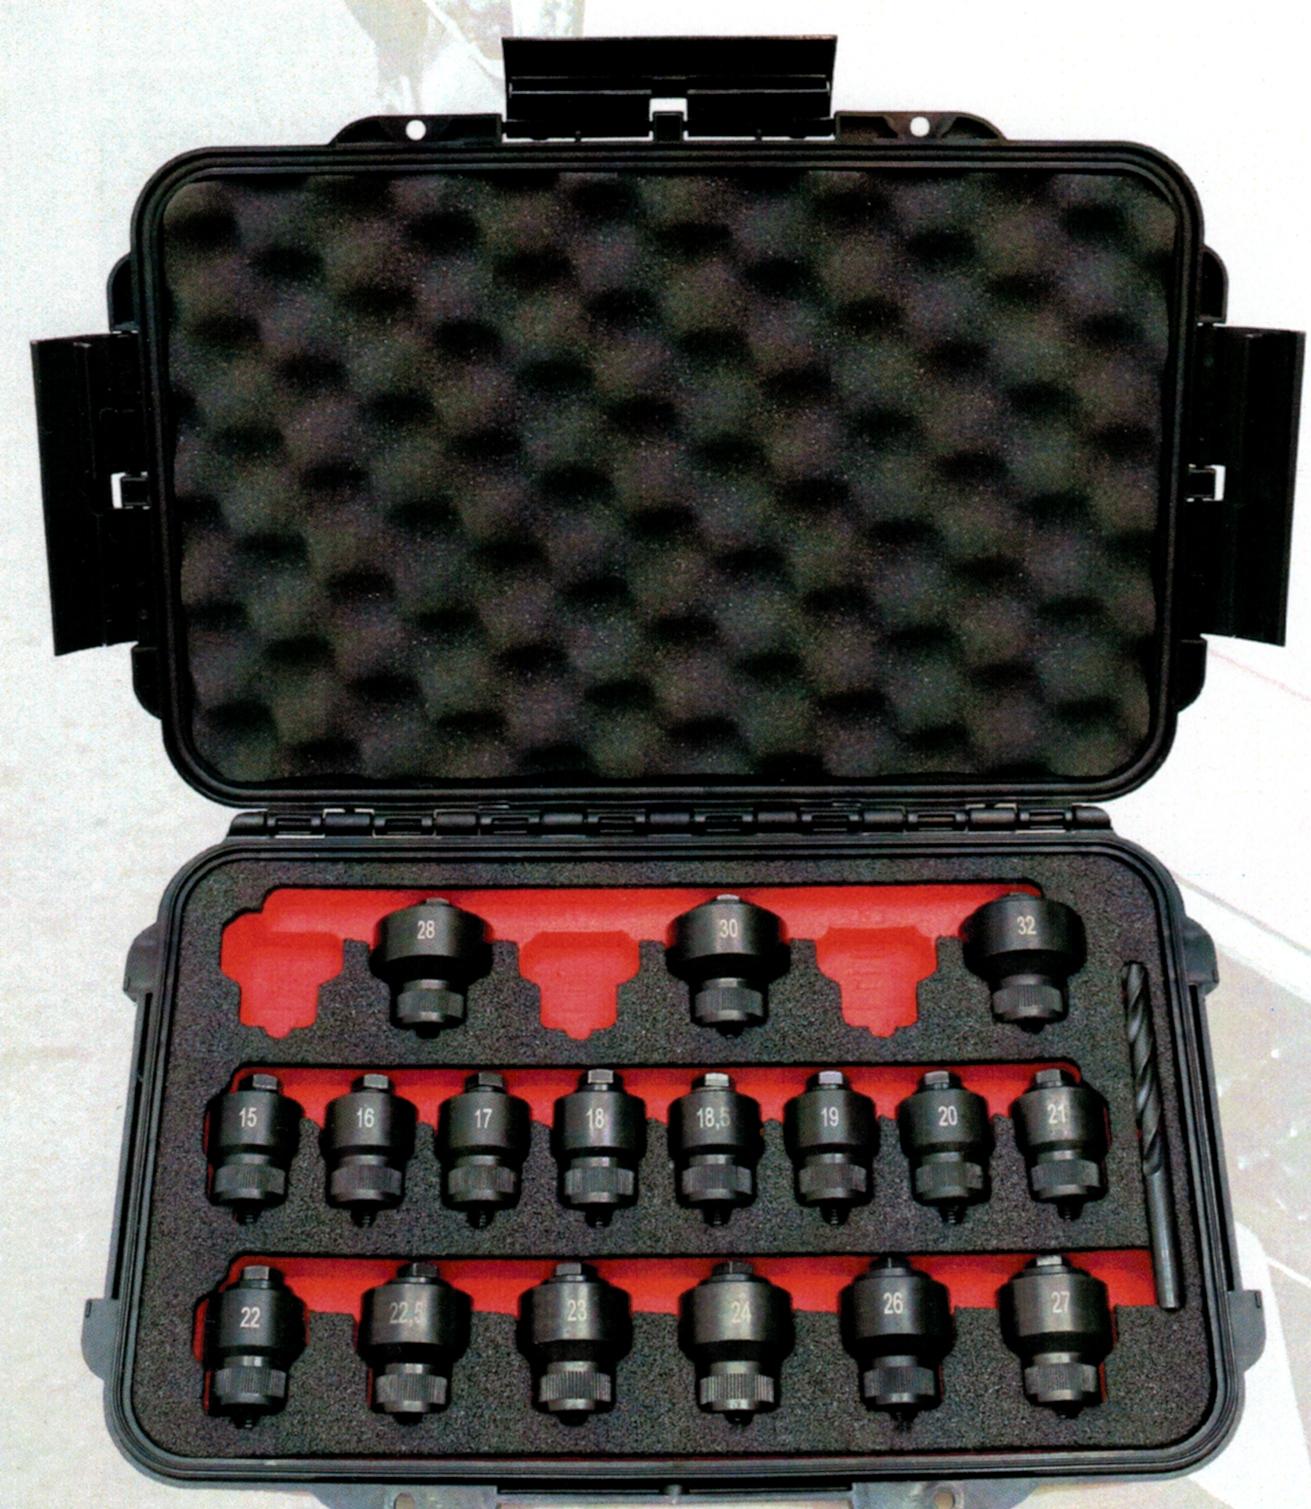 Kits de abertura de furos para encaixe de sensores